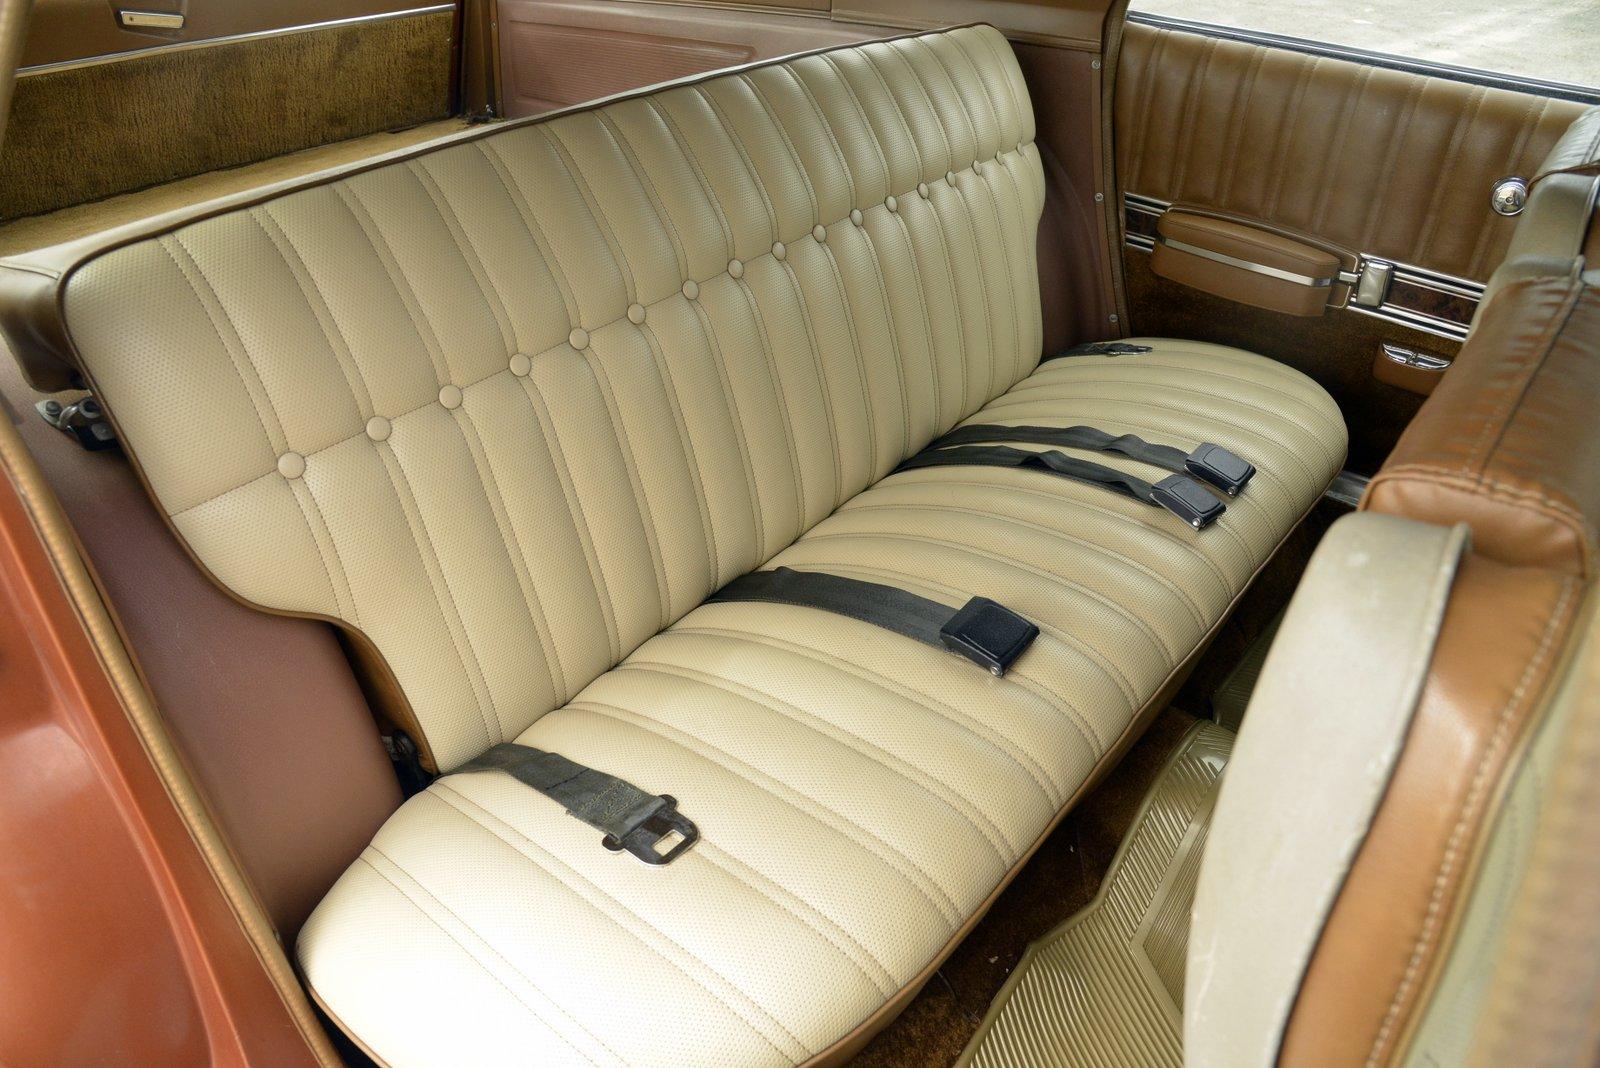 1972 AMC Ambassador Brougham Wagon rear bench